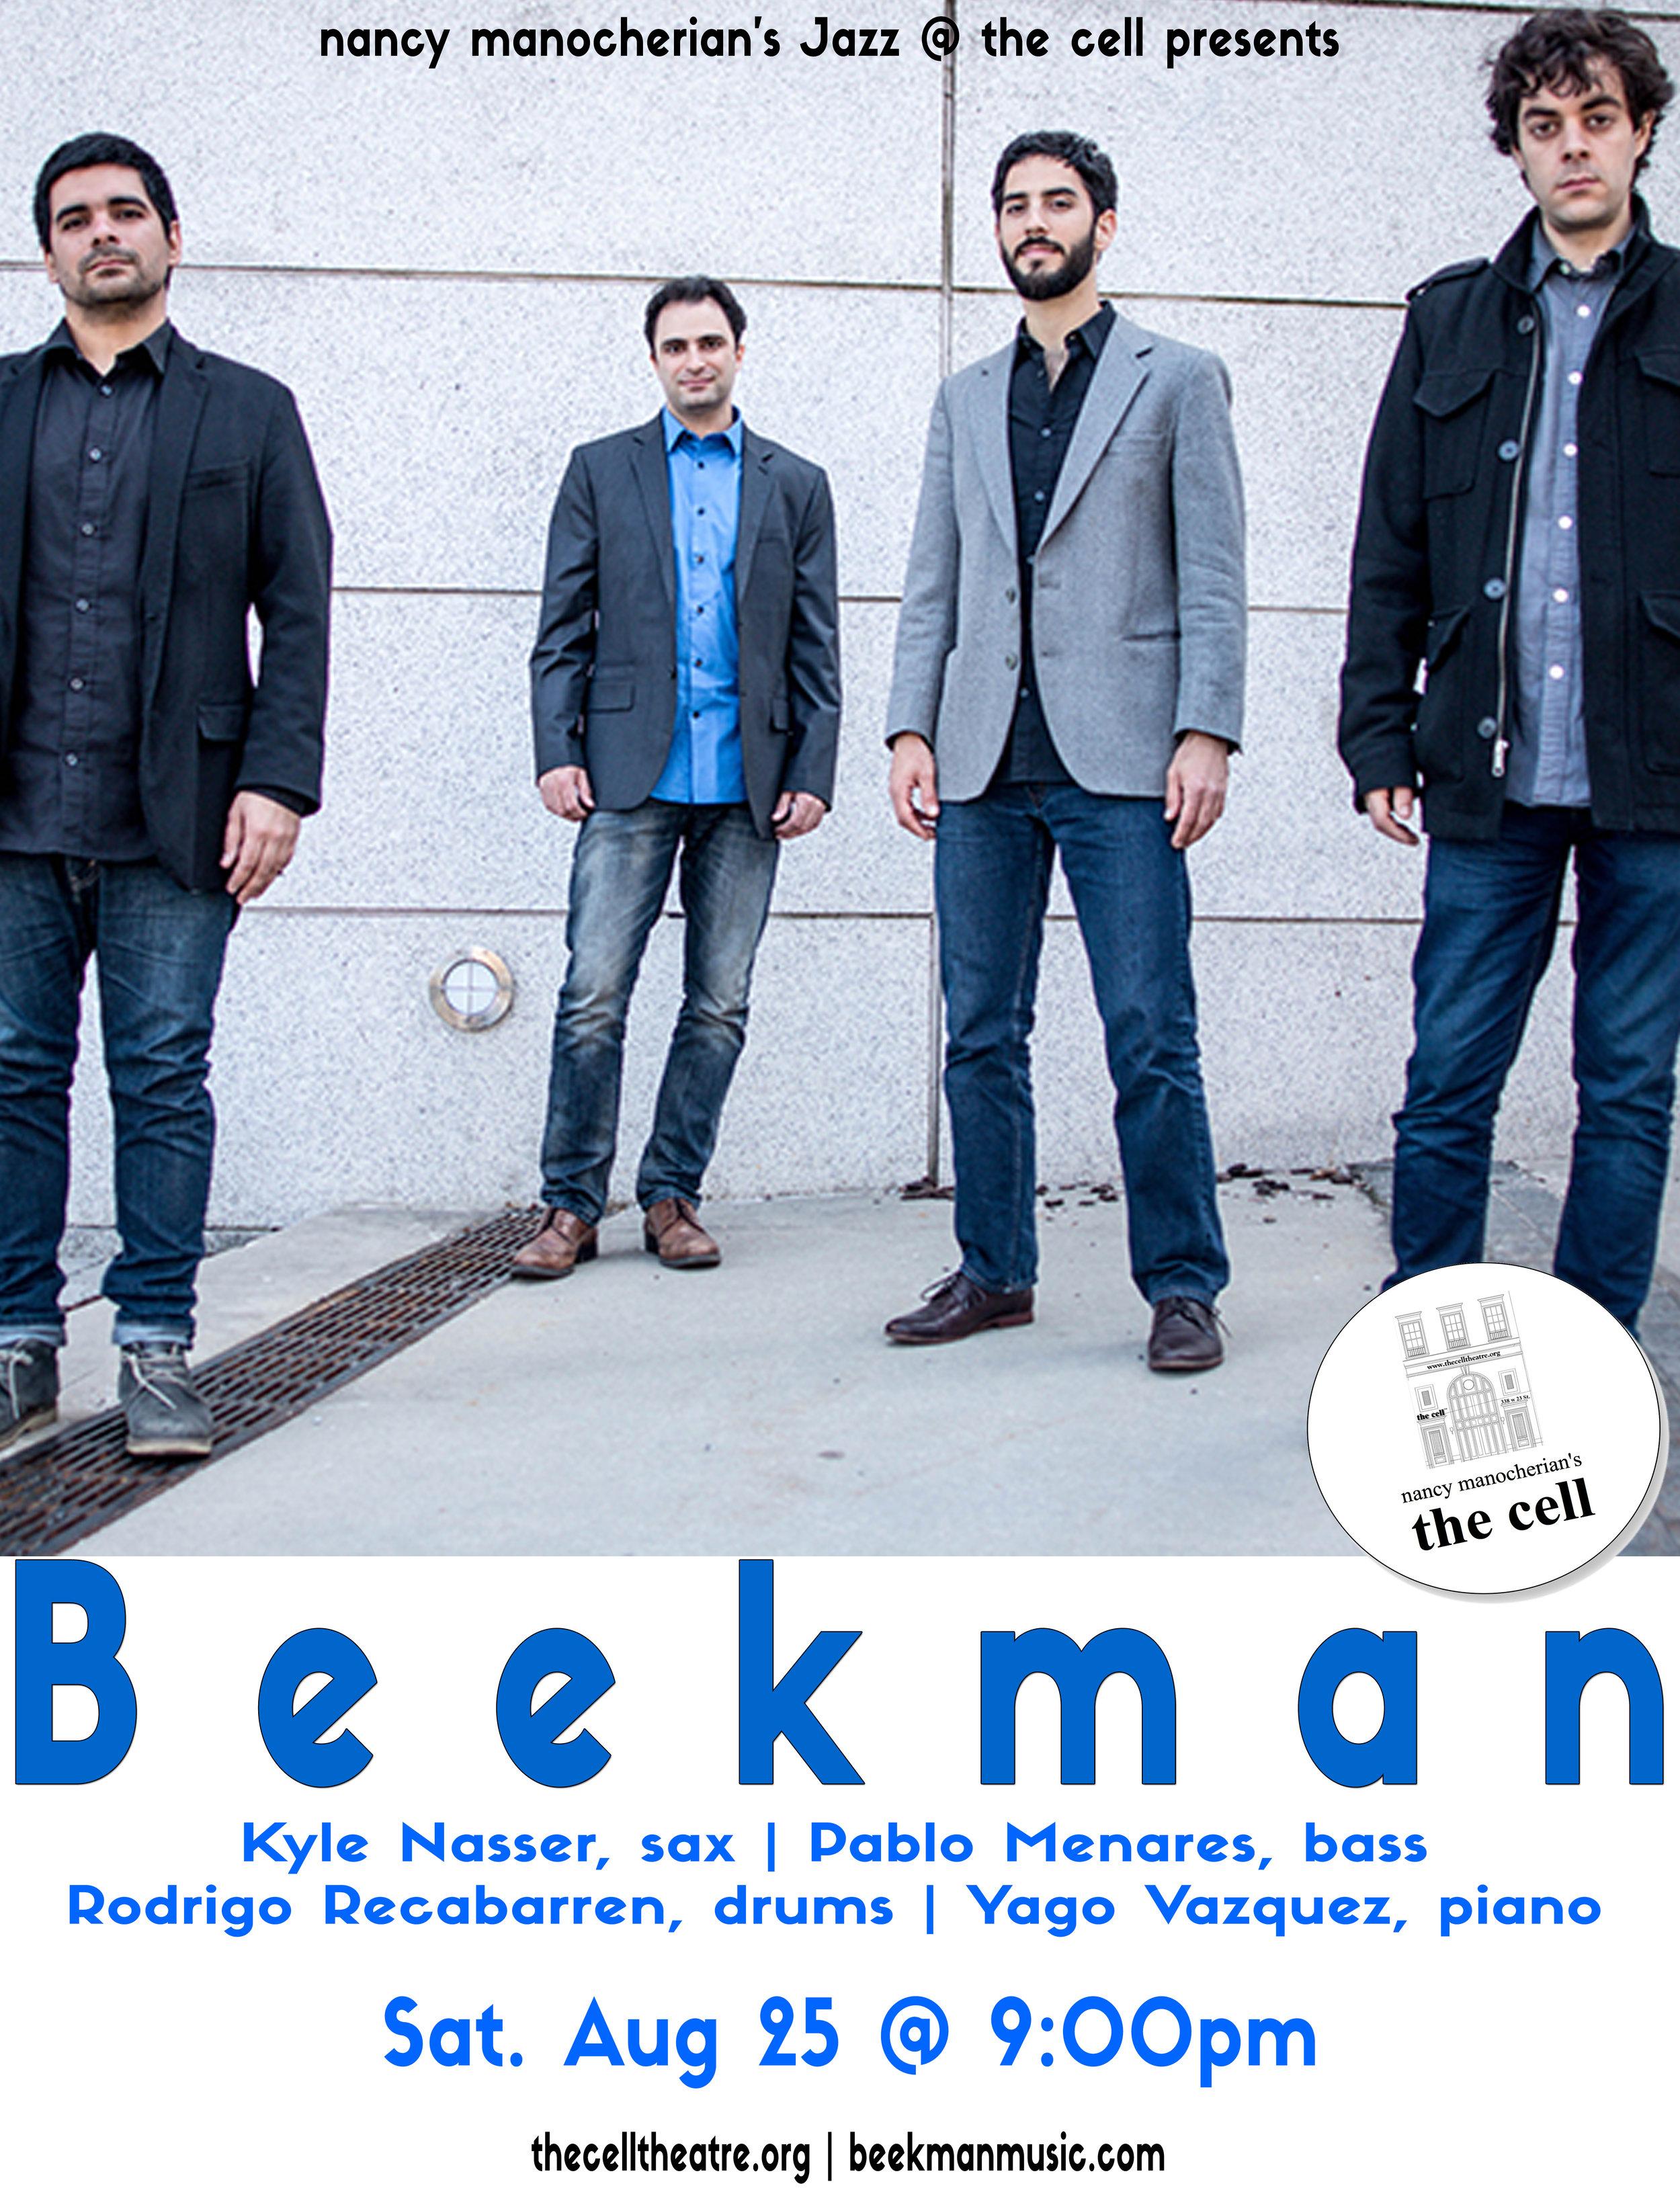 beeekman aug 25 web.jpg